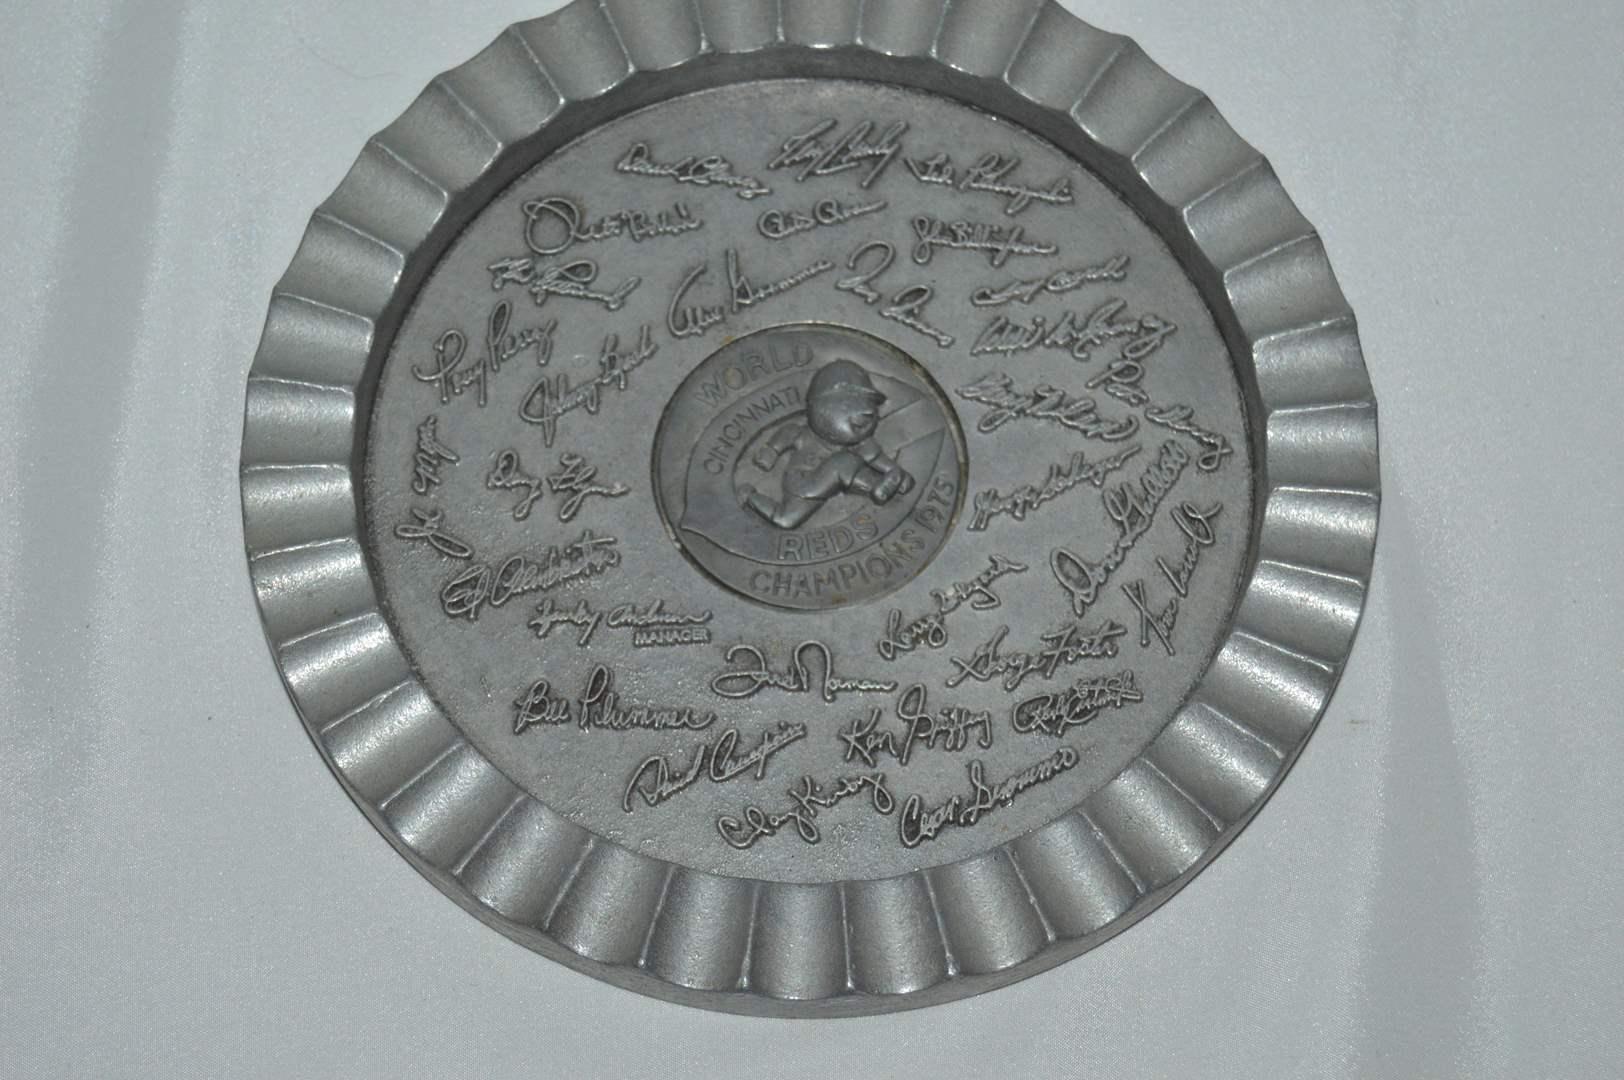 Lot # 124 Vintage Burkhardt's Cincinnati Reds world champions 1975 Metal wall art  (main image)